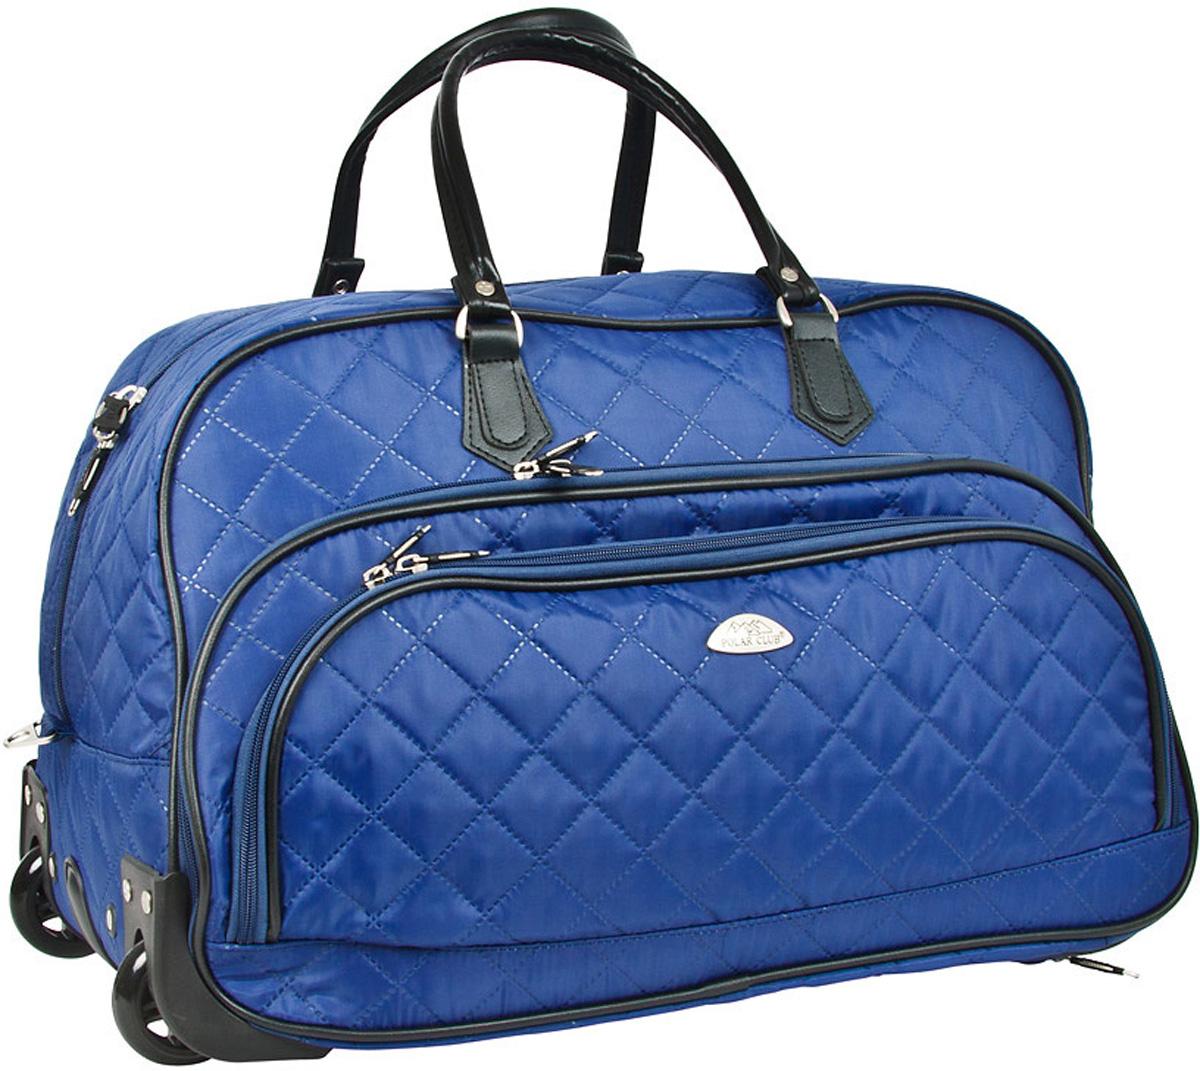 Сумка дорожная Polar Стежка, на колесах, цвет: синий, 51 л. 7050.1 сумка дорожная polar цвет бордовый 46 5 л 7049 2